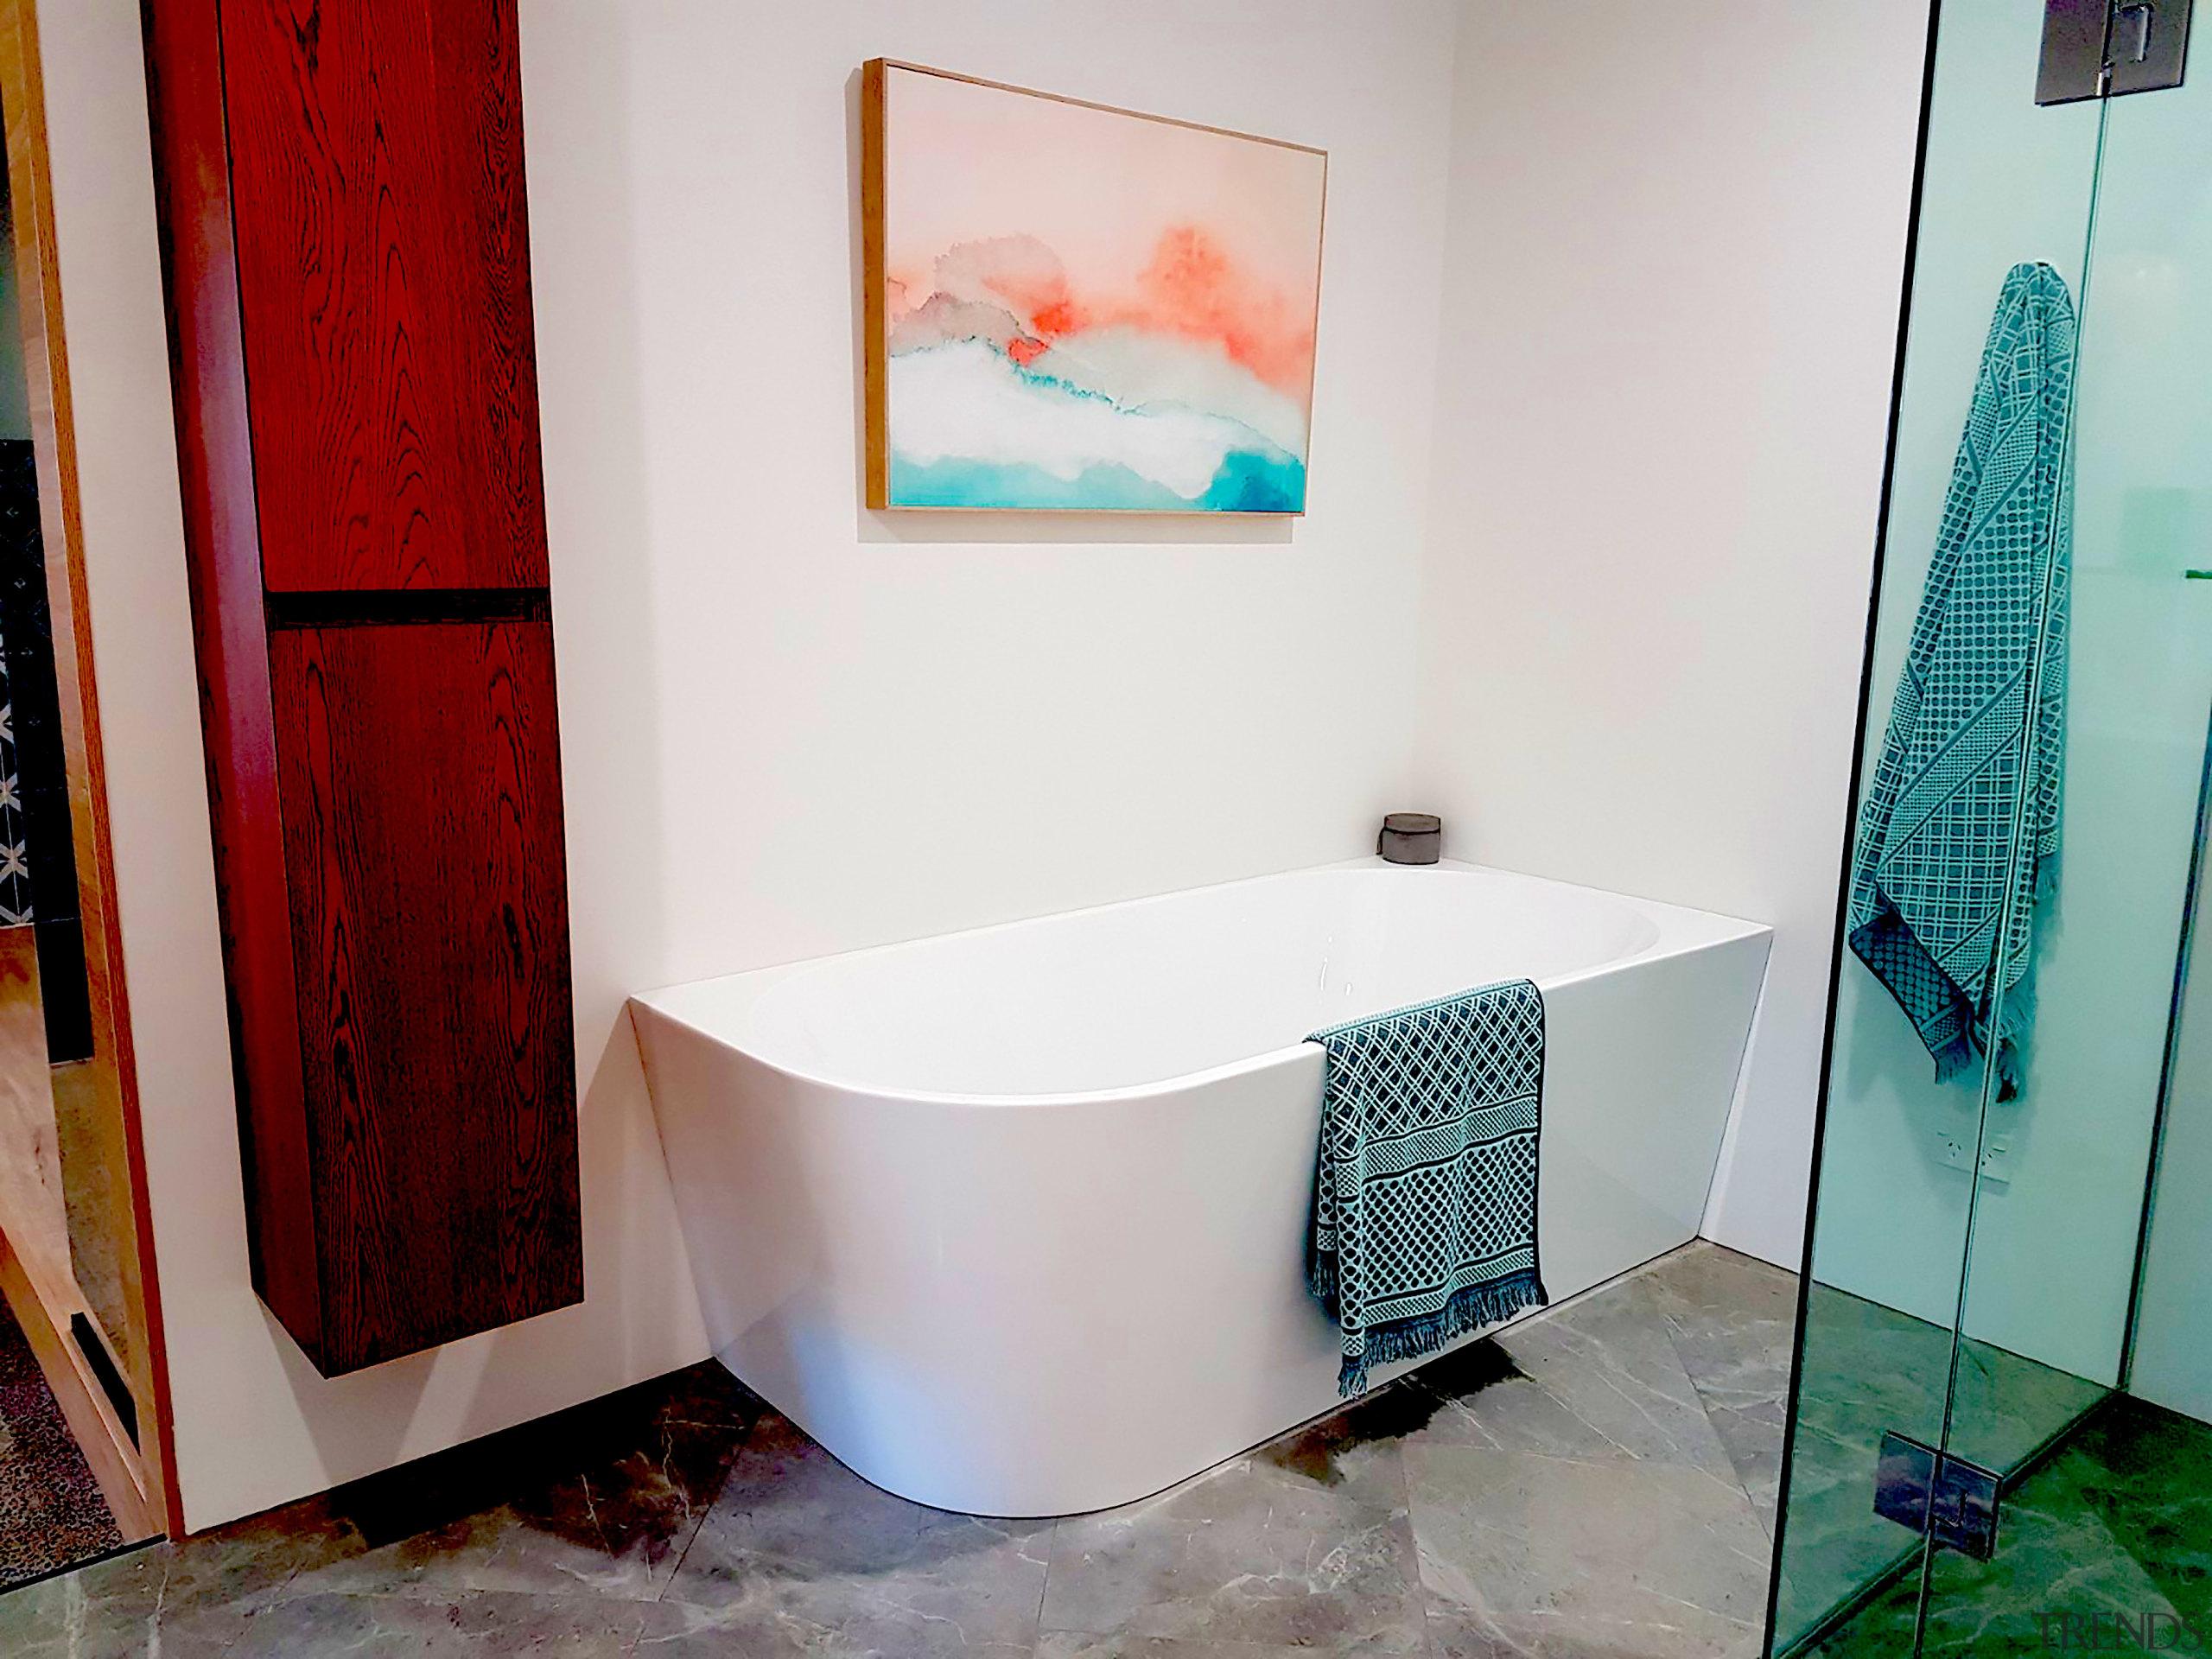 Foto from Newtech Bathroomaware - Corner bath tub bathroom, floor, flooring, interior design, plumbing fixture, property, room, tile, white